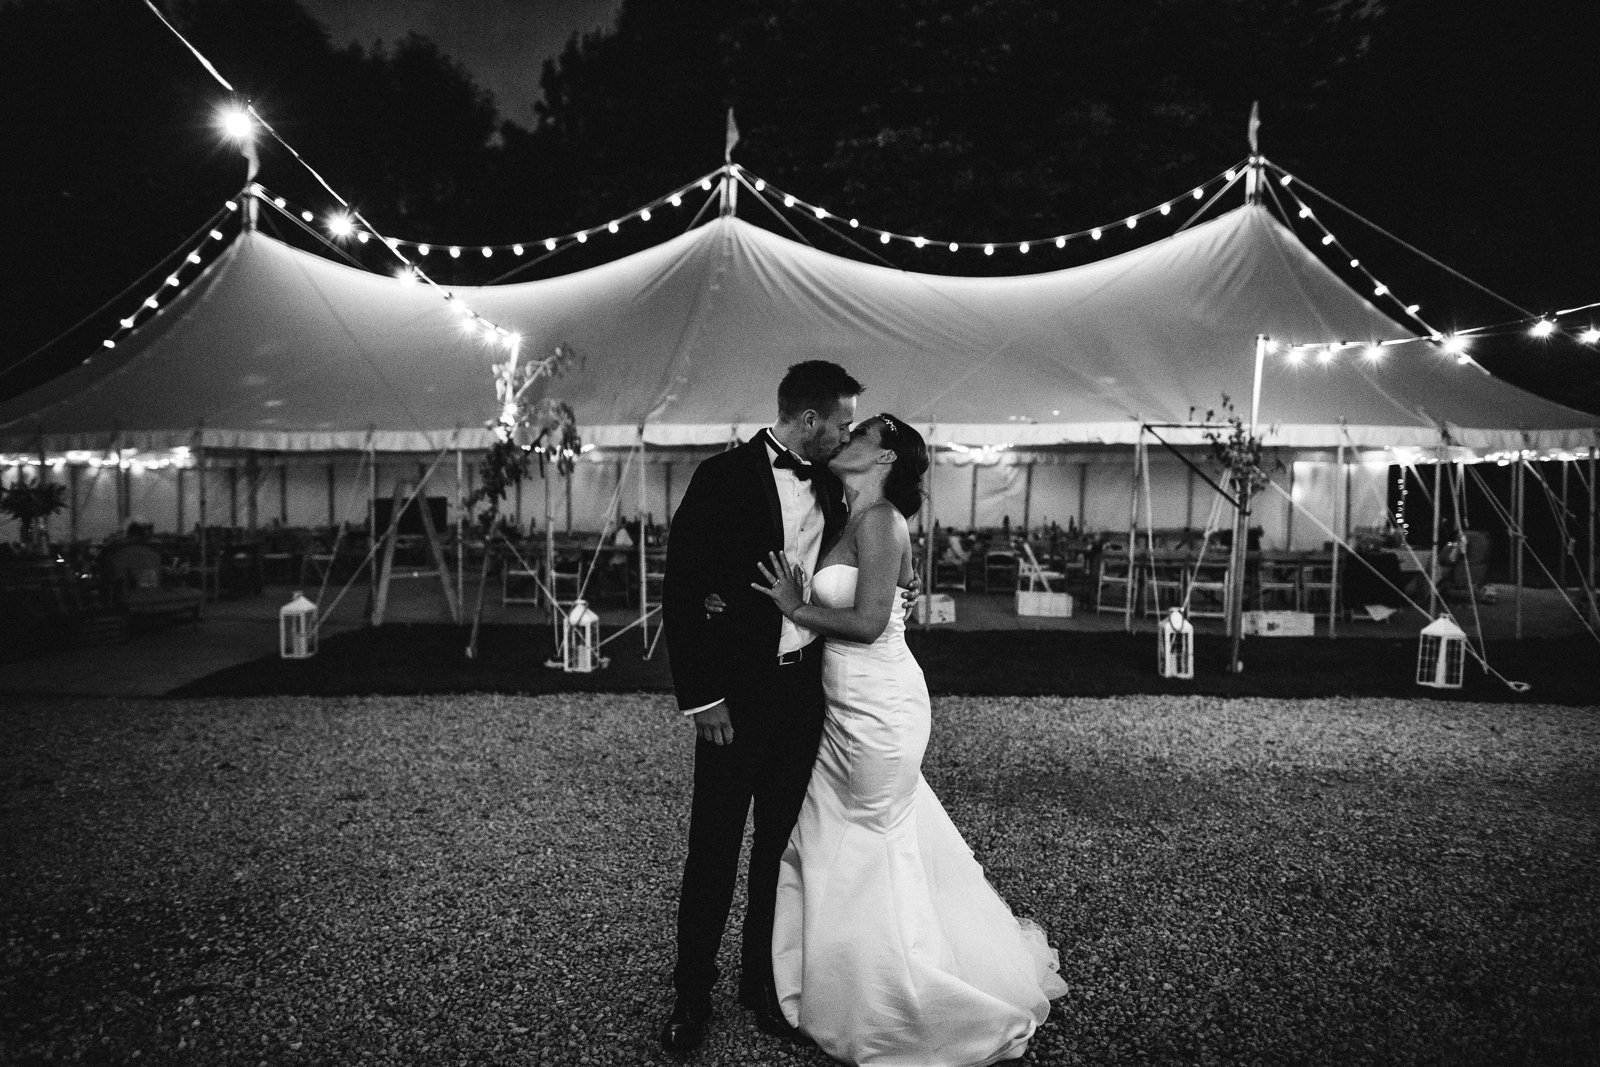 Sheffield weddingSheffield wedding photographer